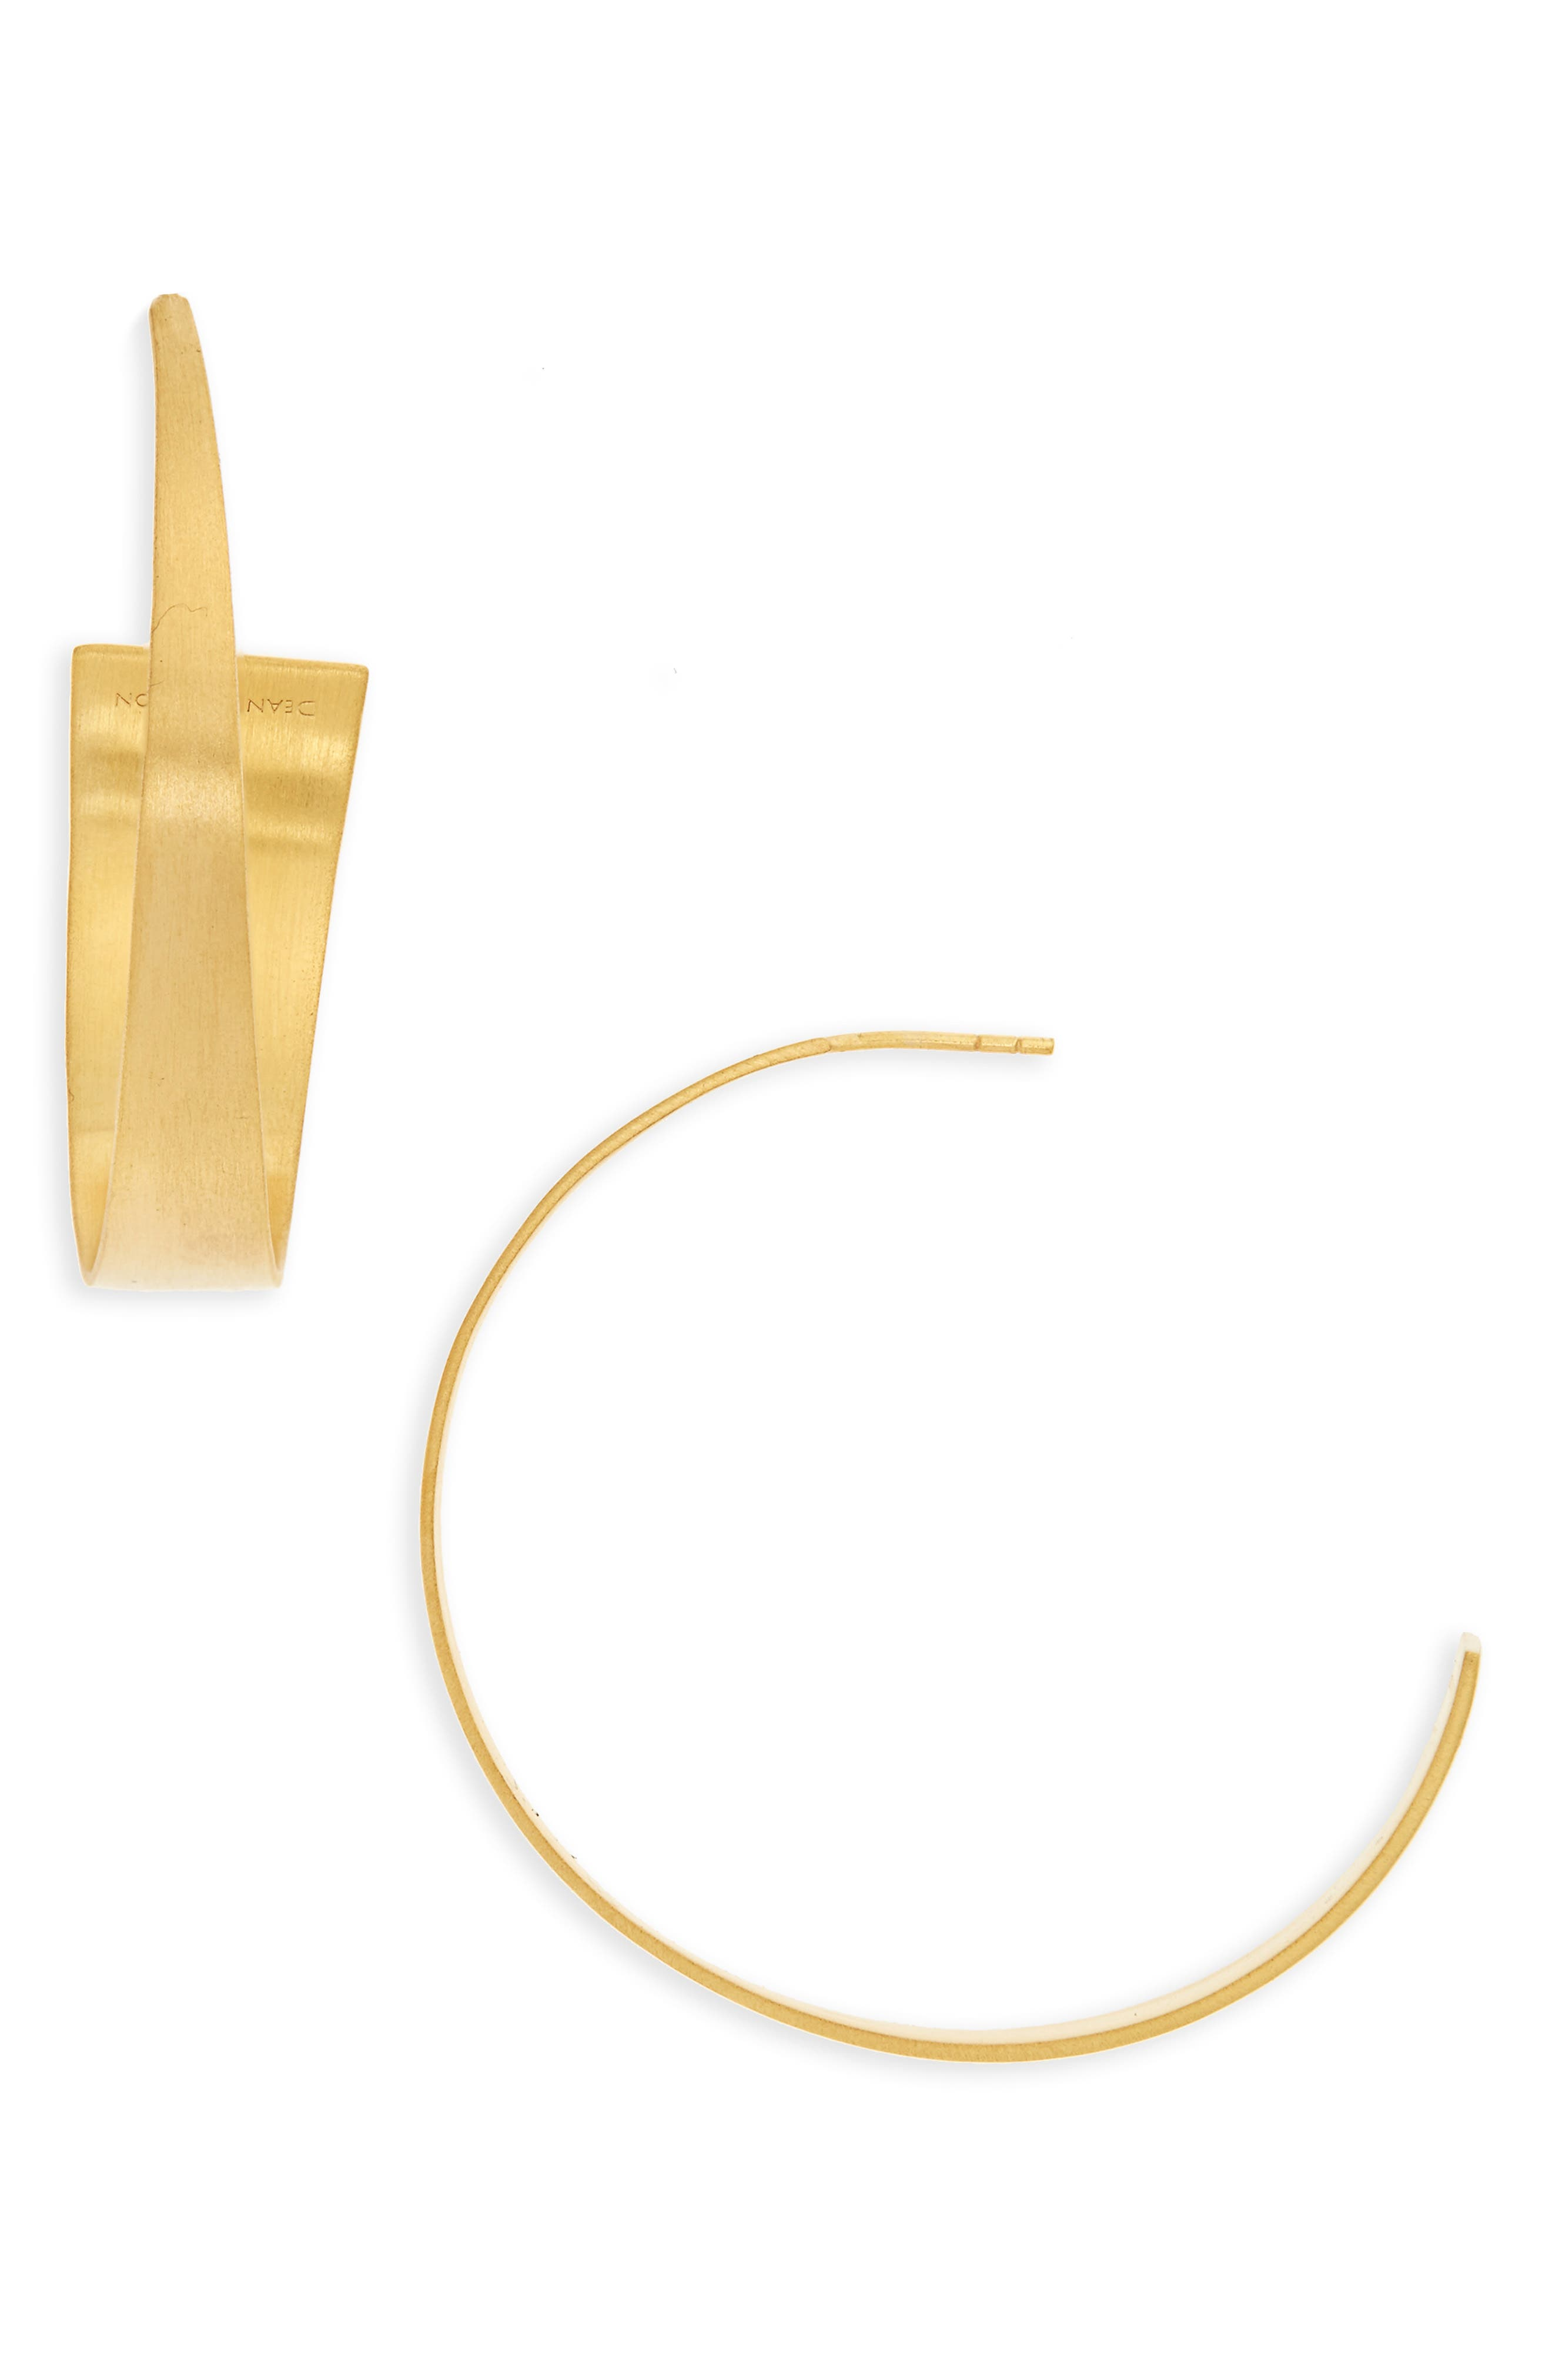 Main Image - Dean Davidson Bossa Hoop Earrings